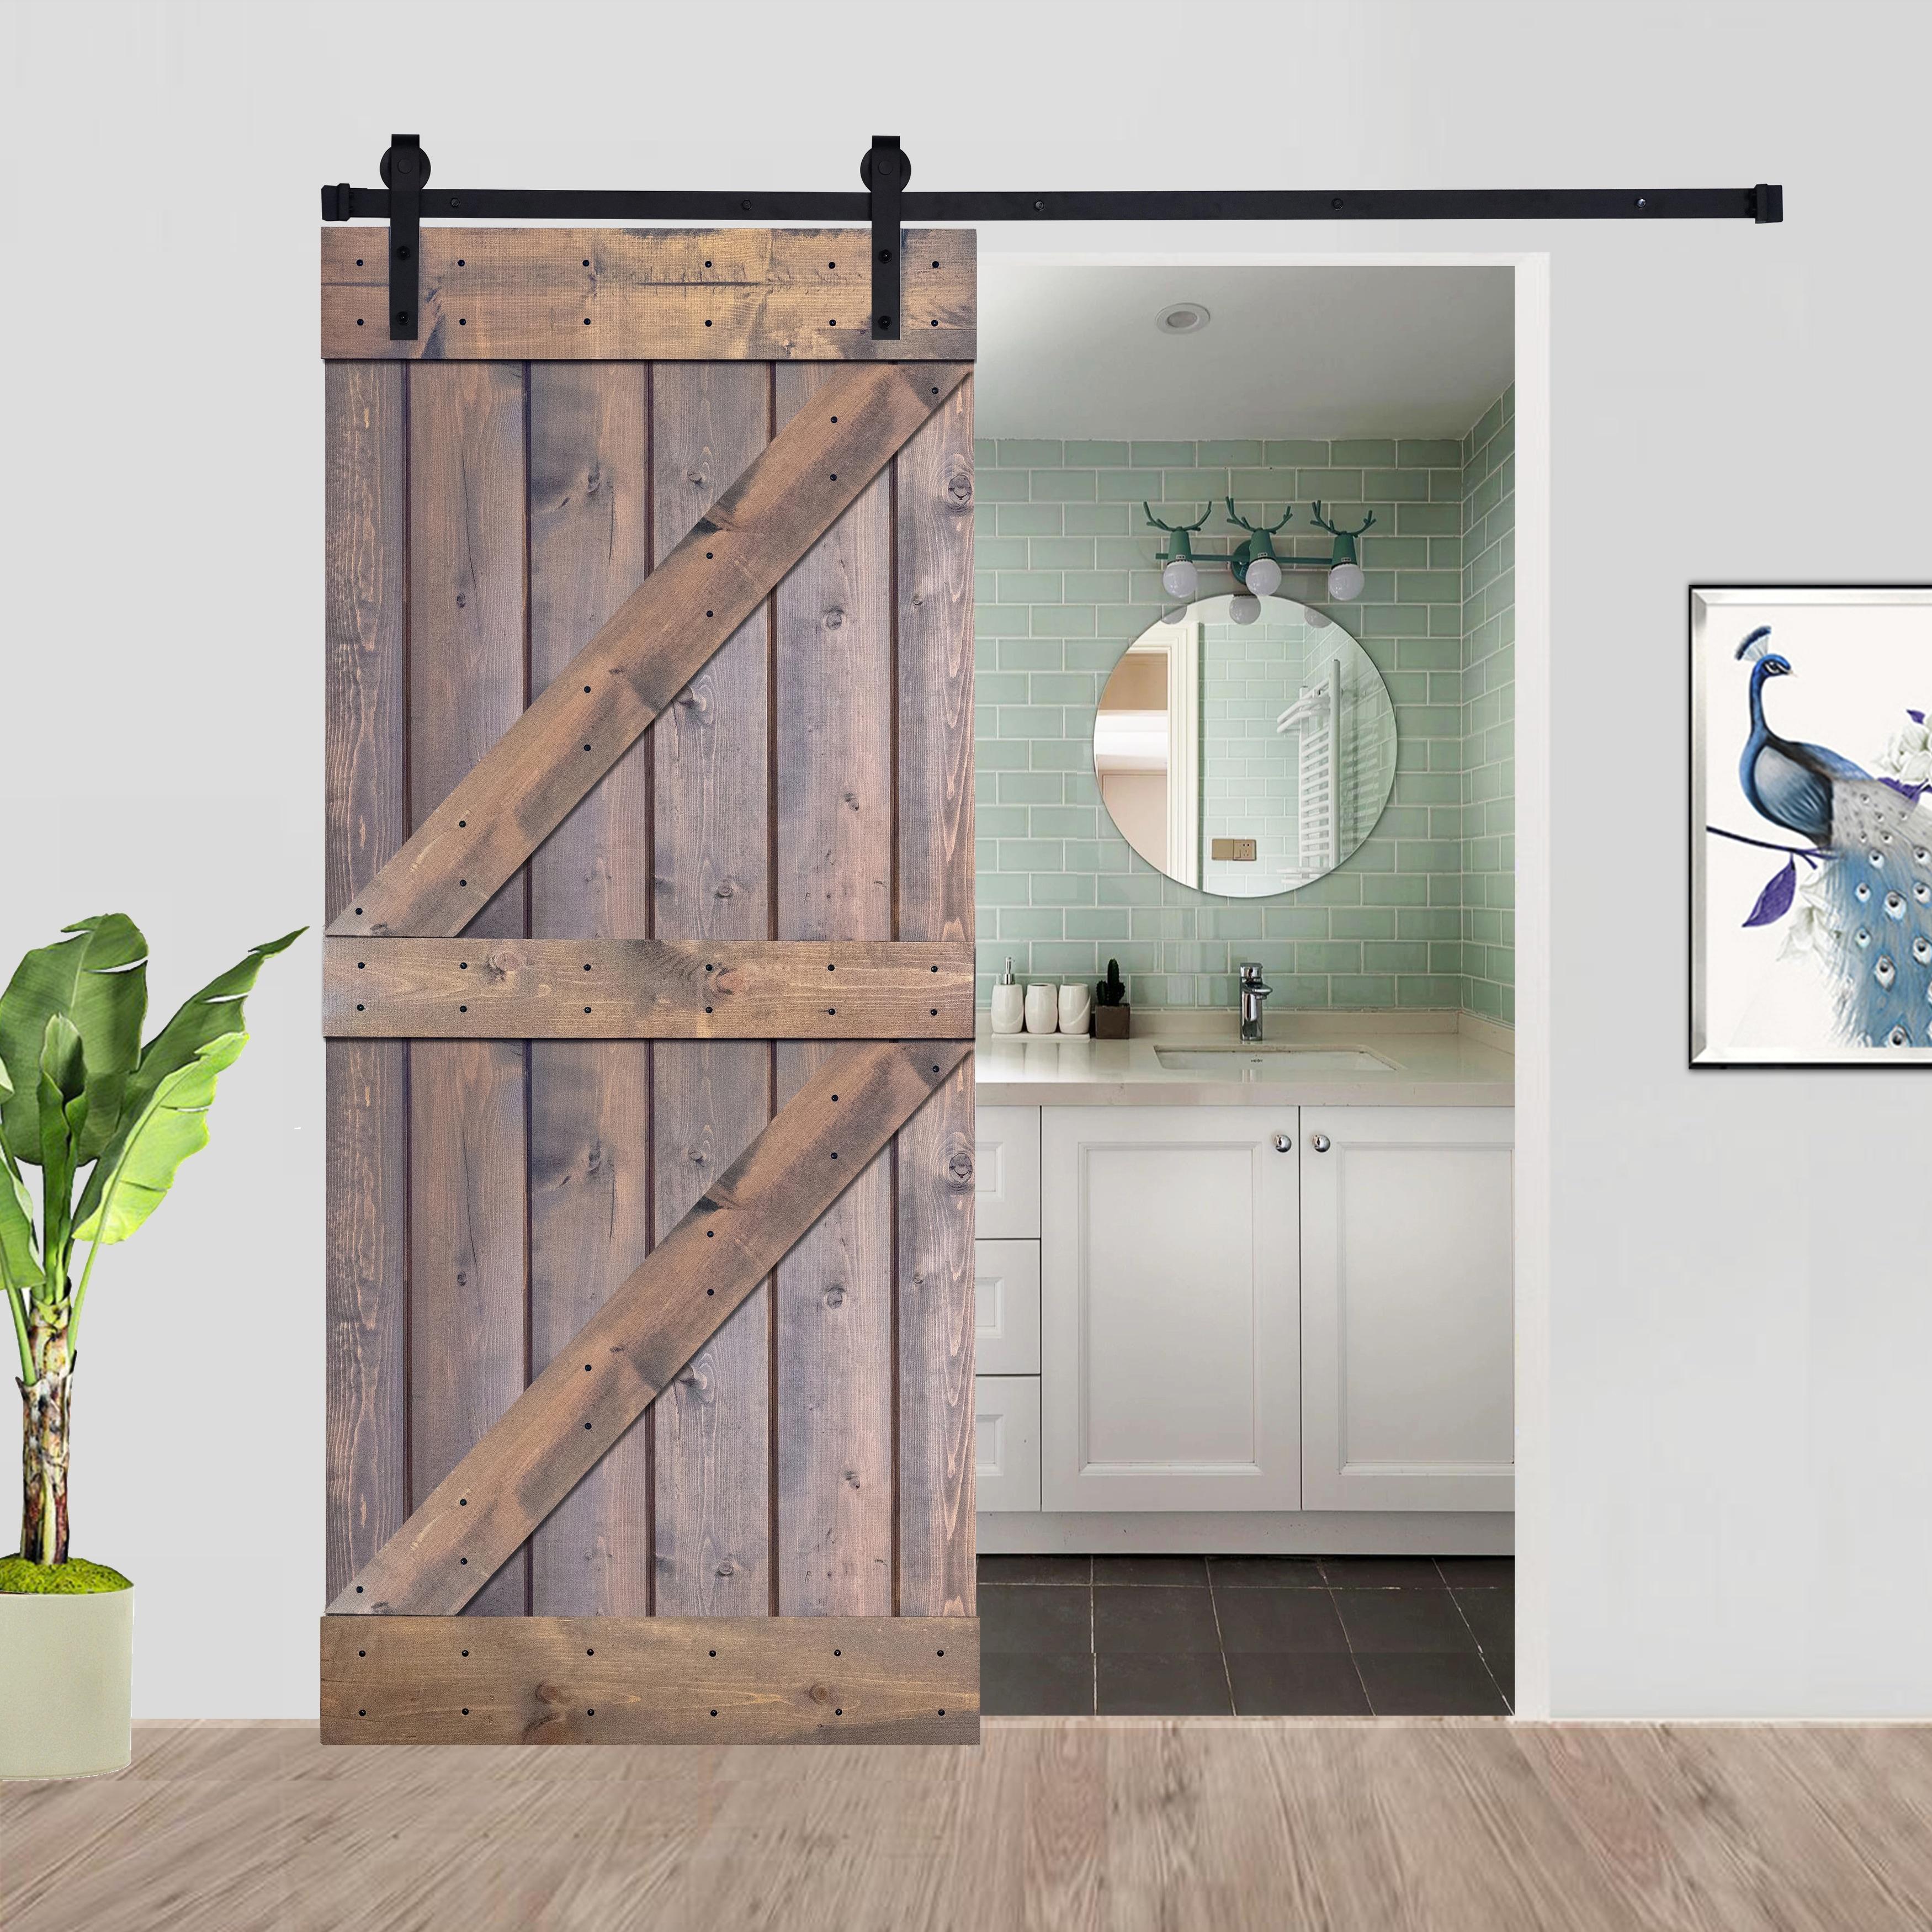 Paneled Wood Barn Door With Installation Hardware Kit K4 Series Overstock 31705831